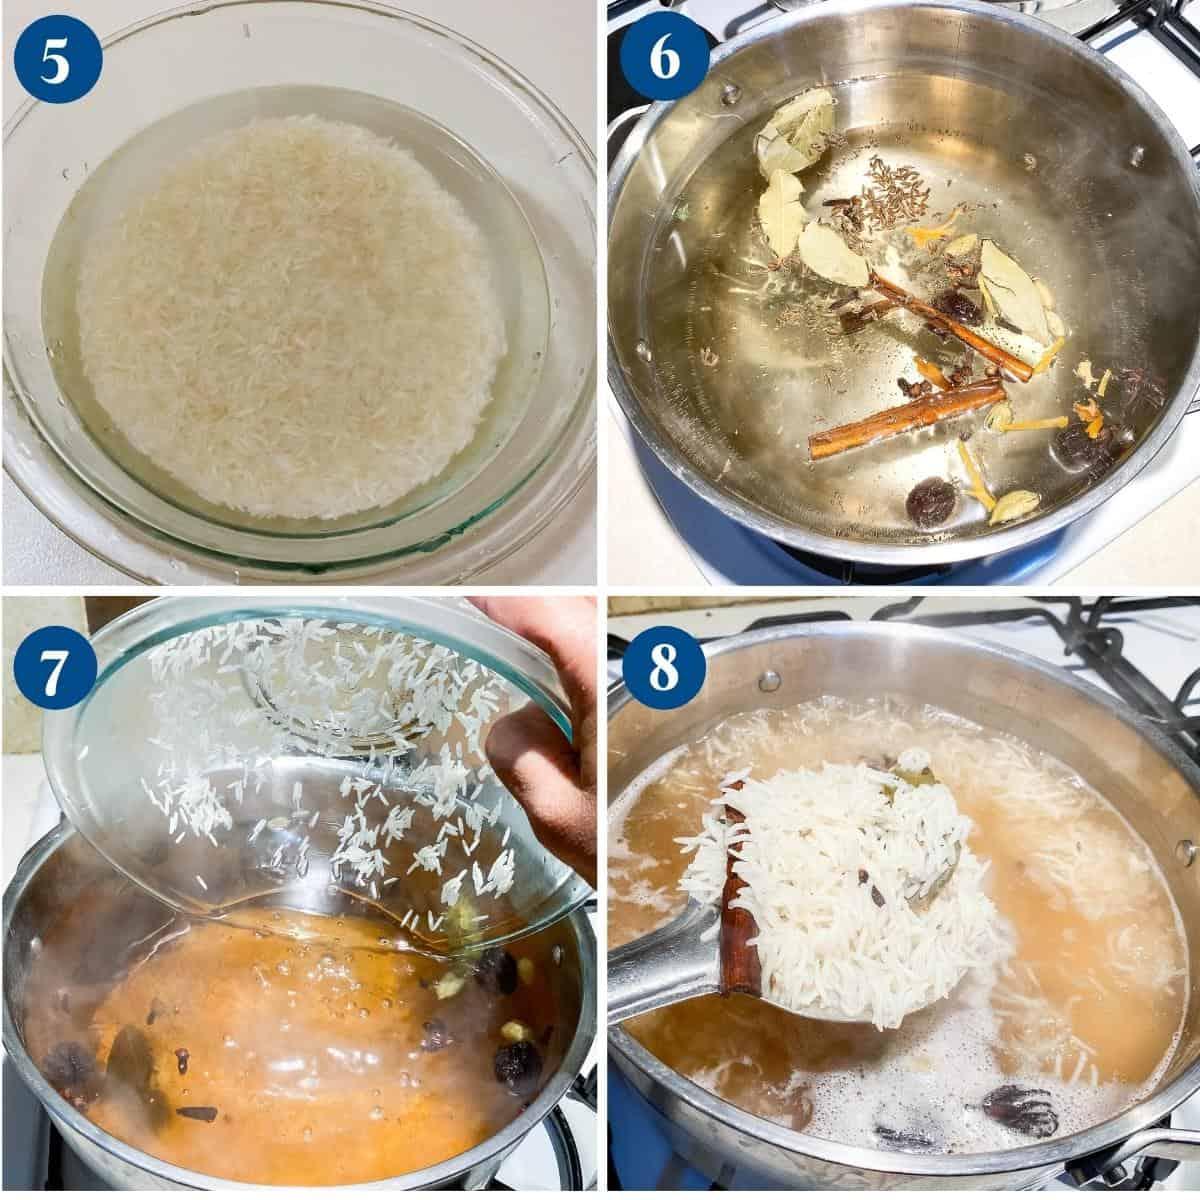 Progress pictures cooking the basmati rice for biryani.